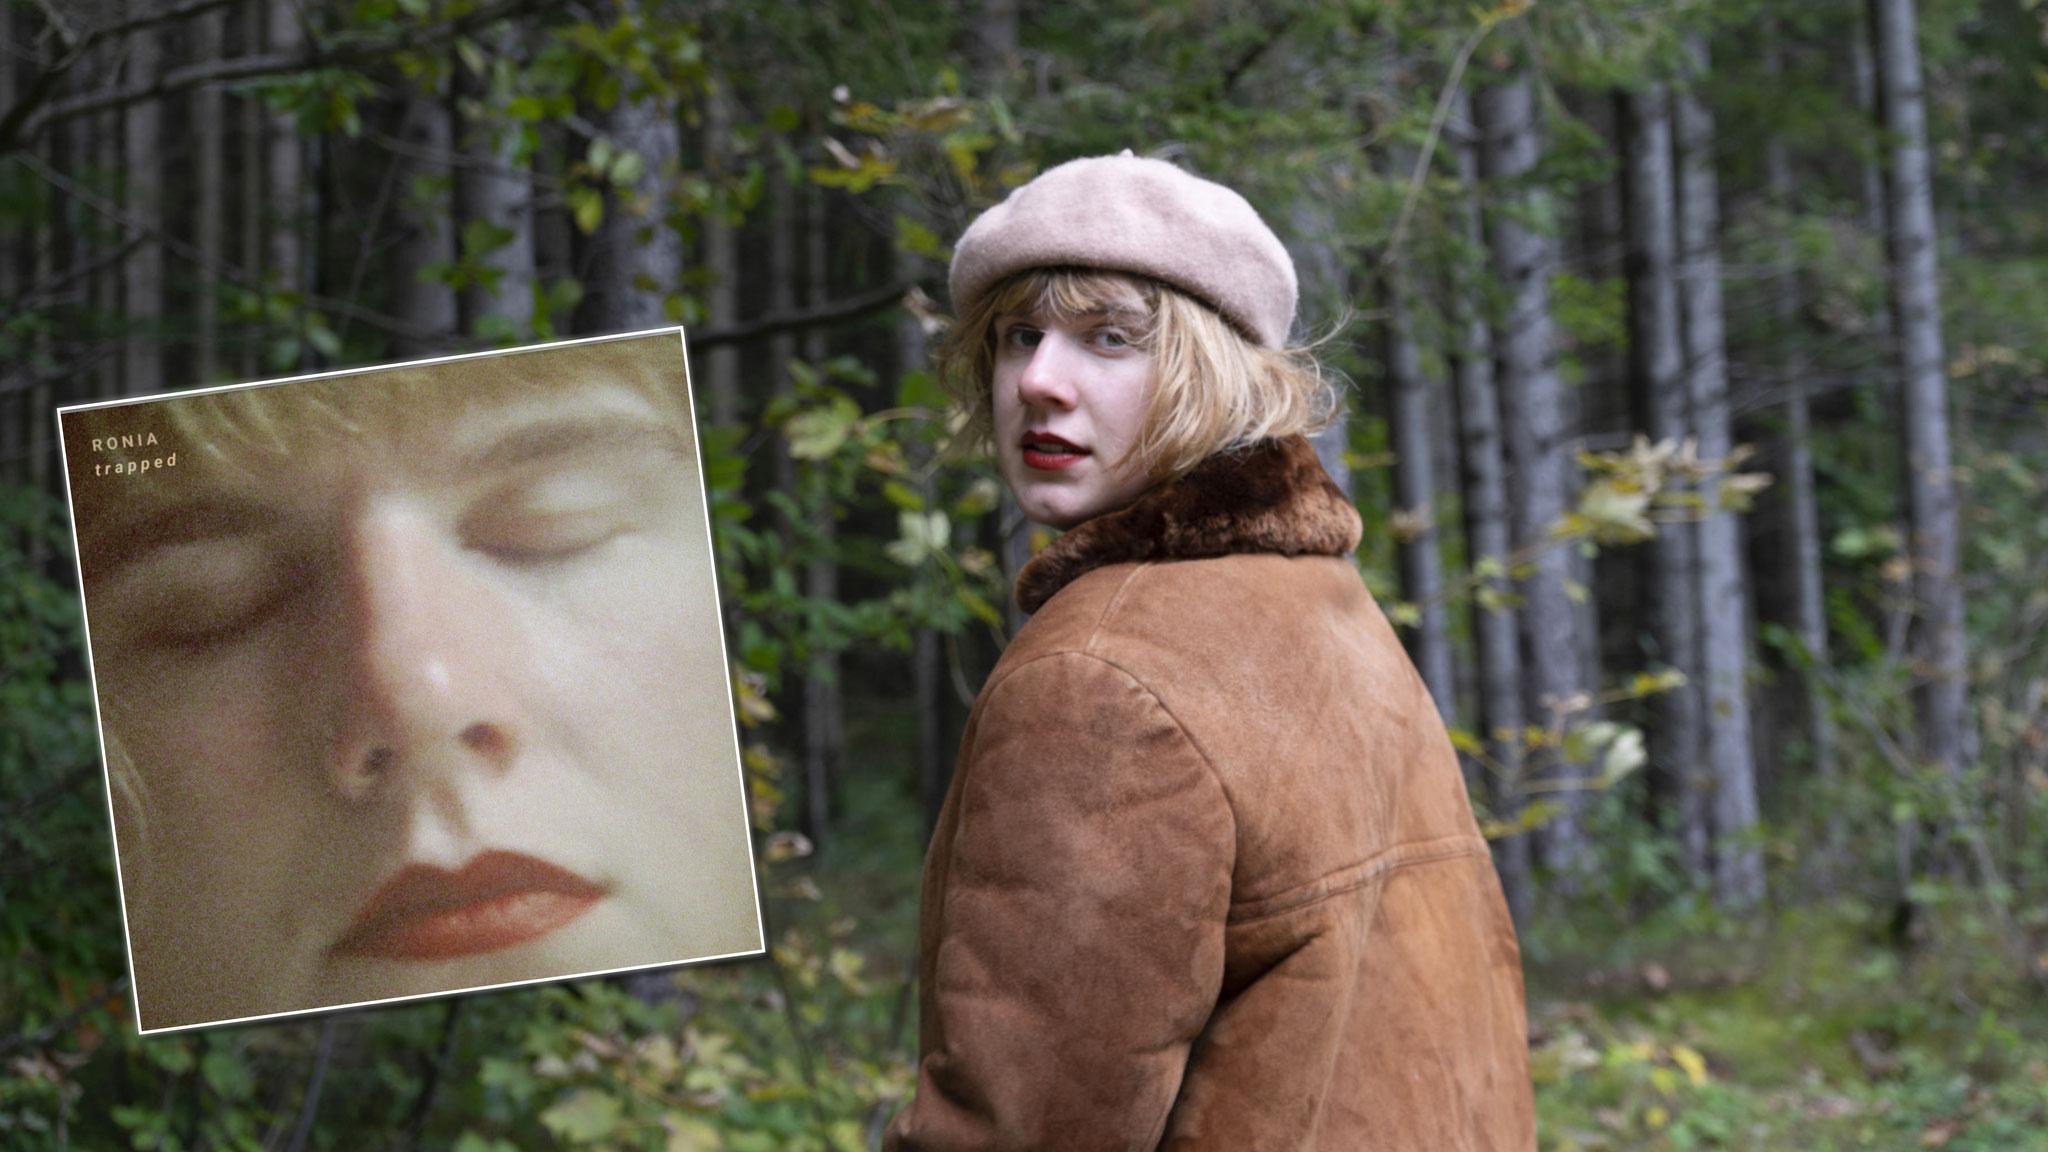 "Sängerin R o n i a mit Debütsingle ""Trapped"" (c) Mira Klug"